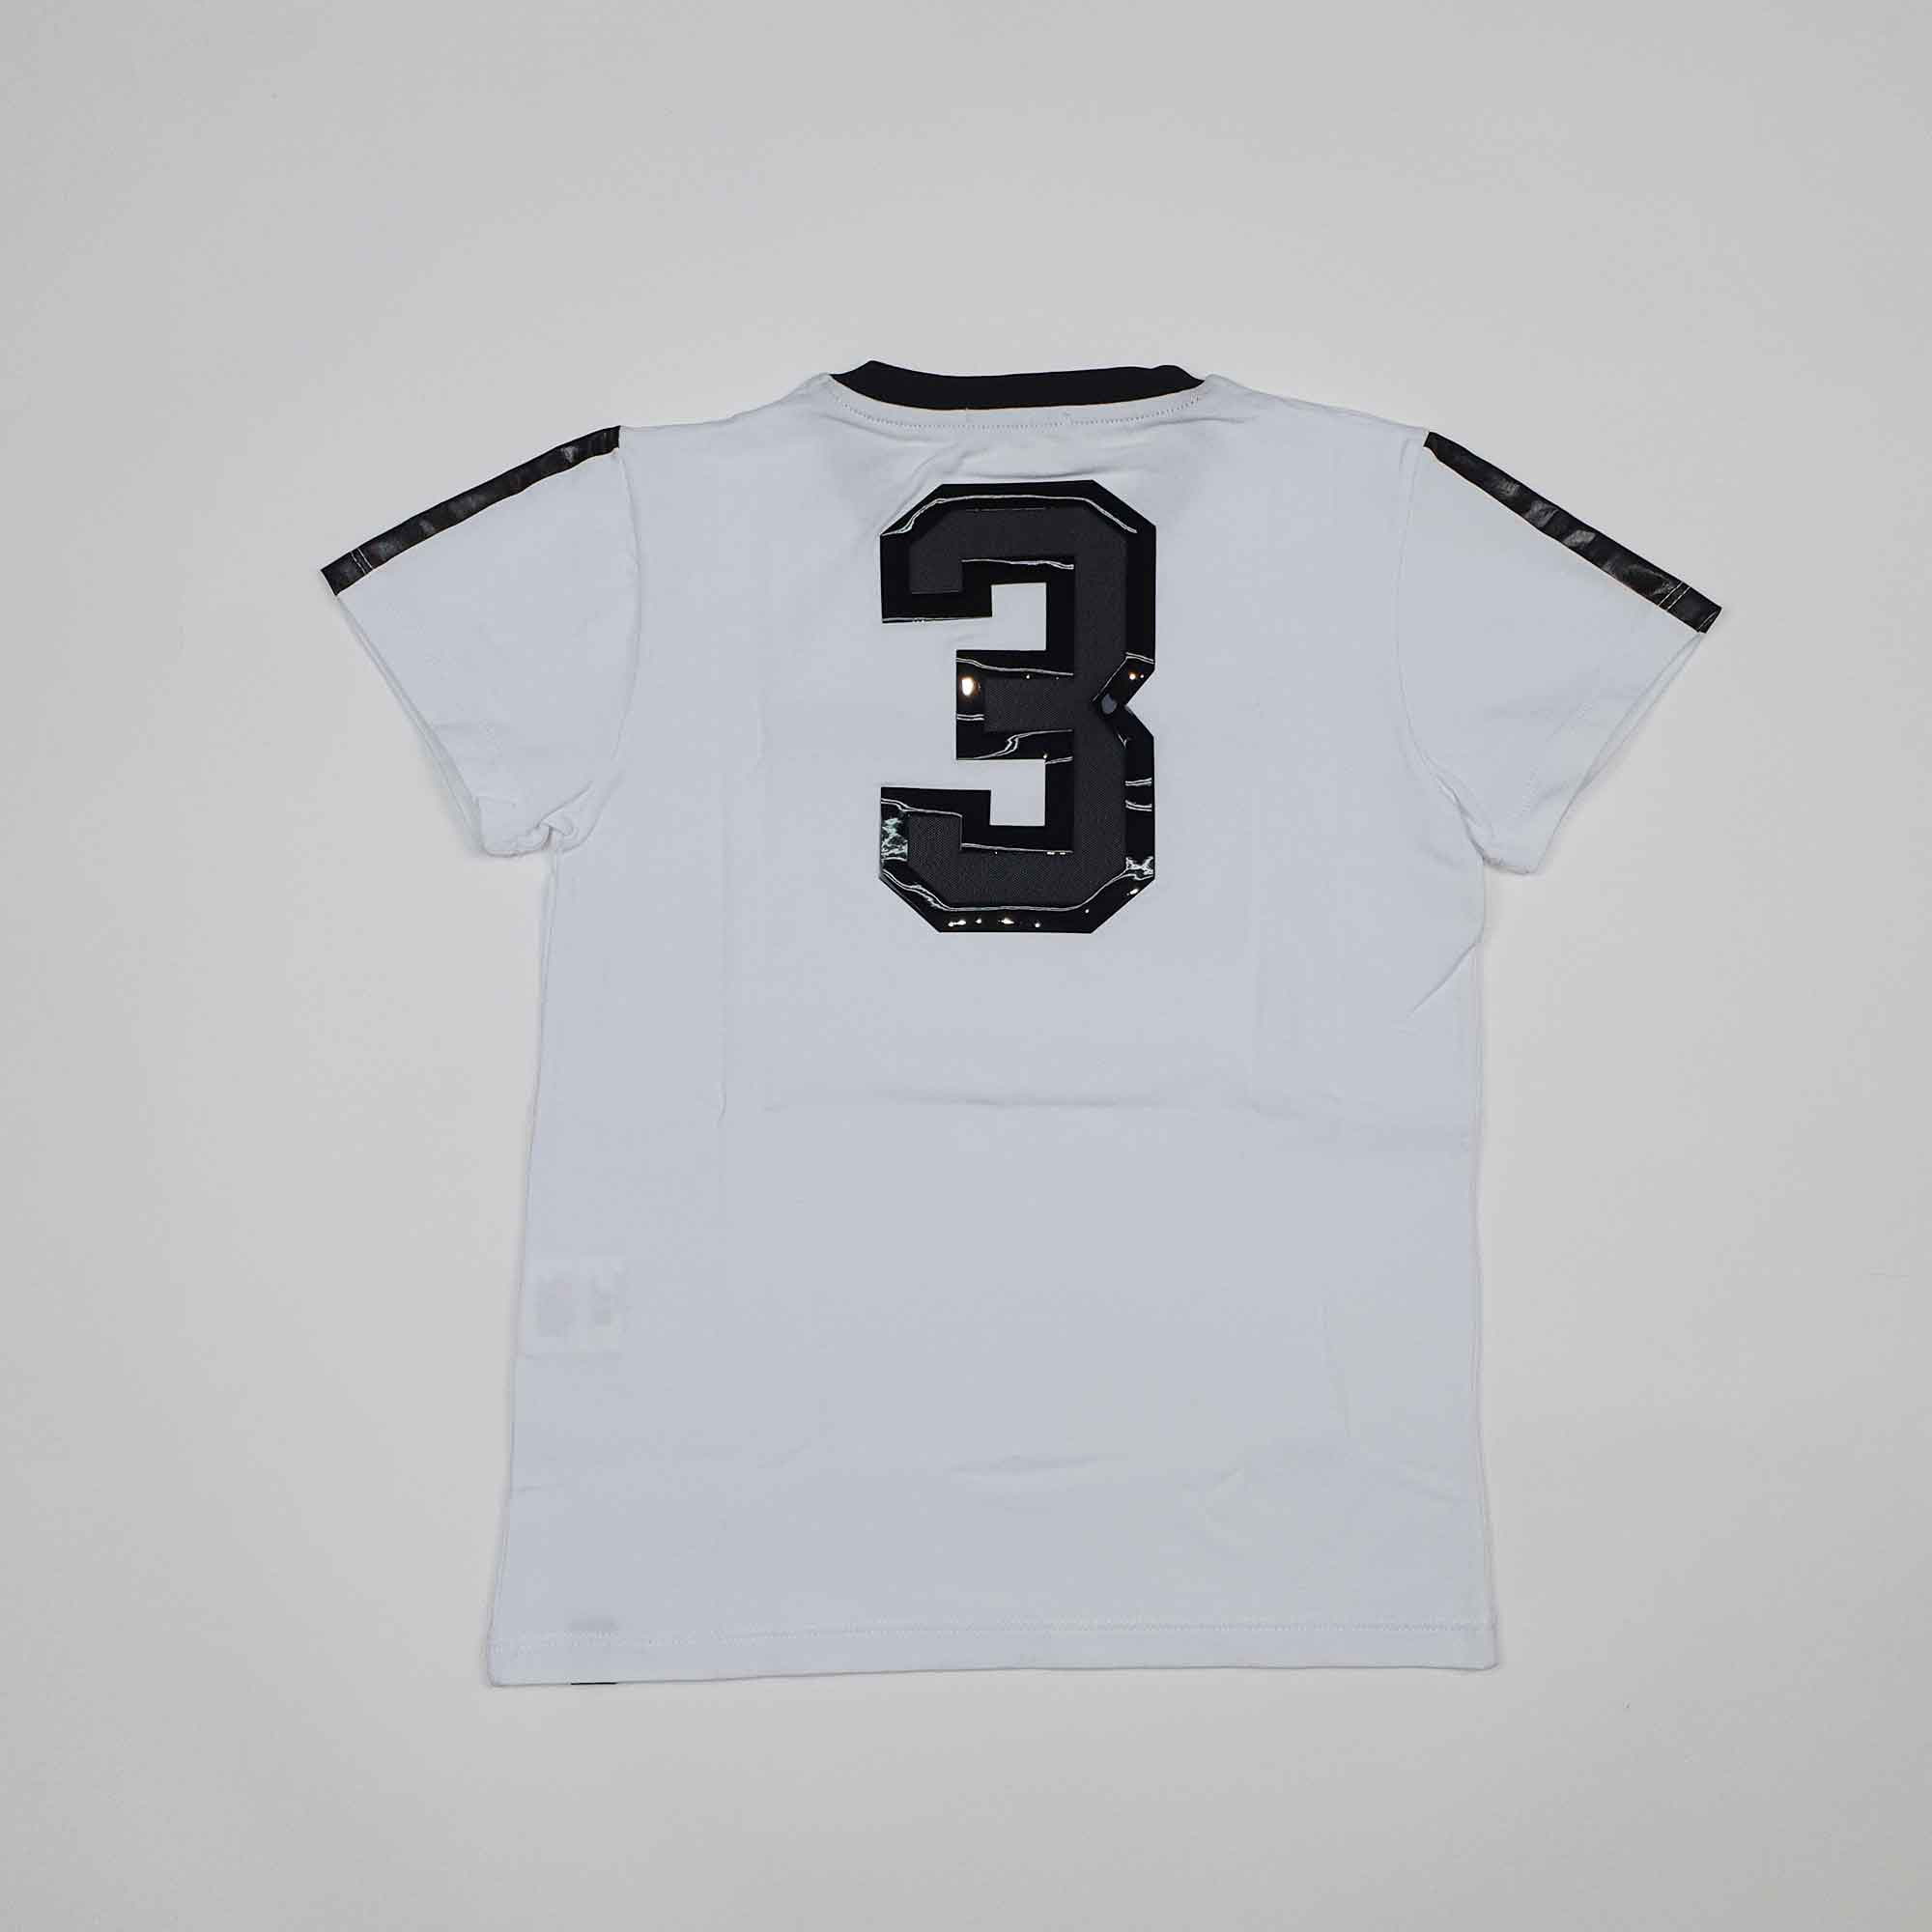 T-shirt inserti in gomma lucida - Bianco